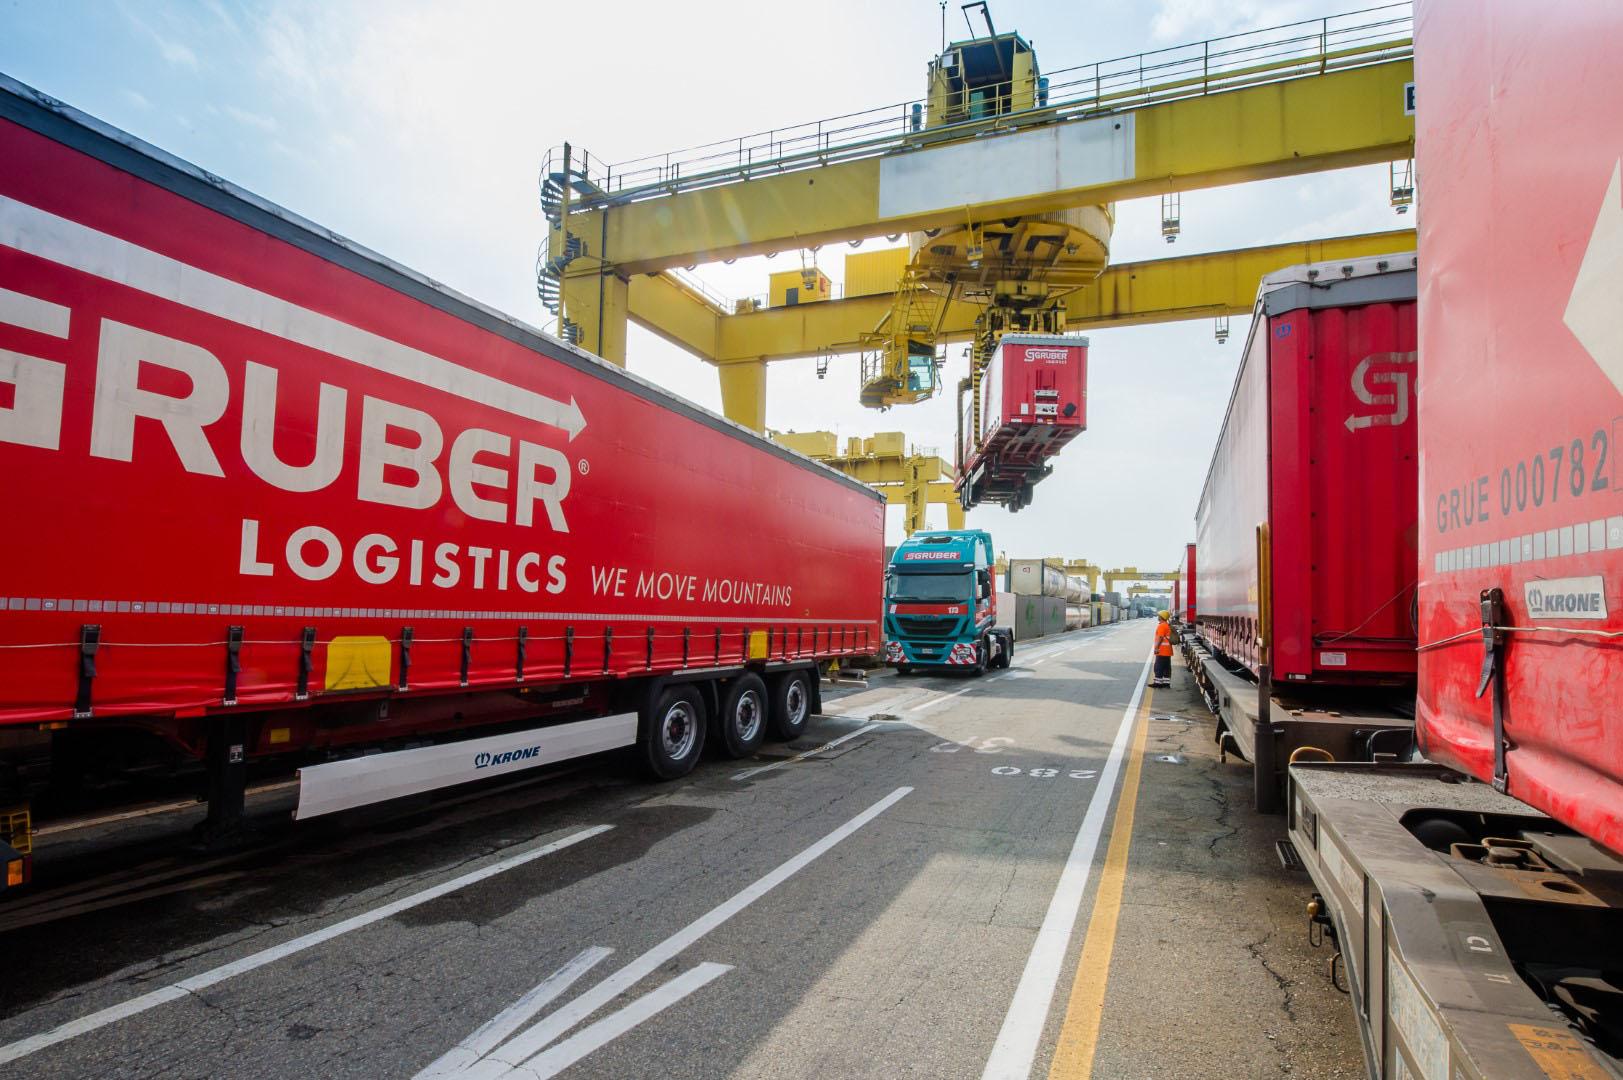 Gruber Logistics Hupac 11849 1 - FTL - Full truck loads